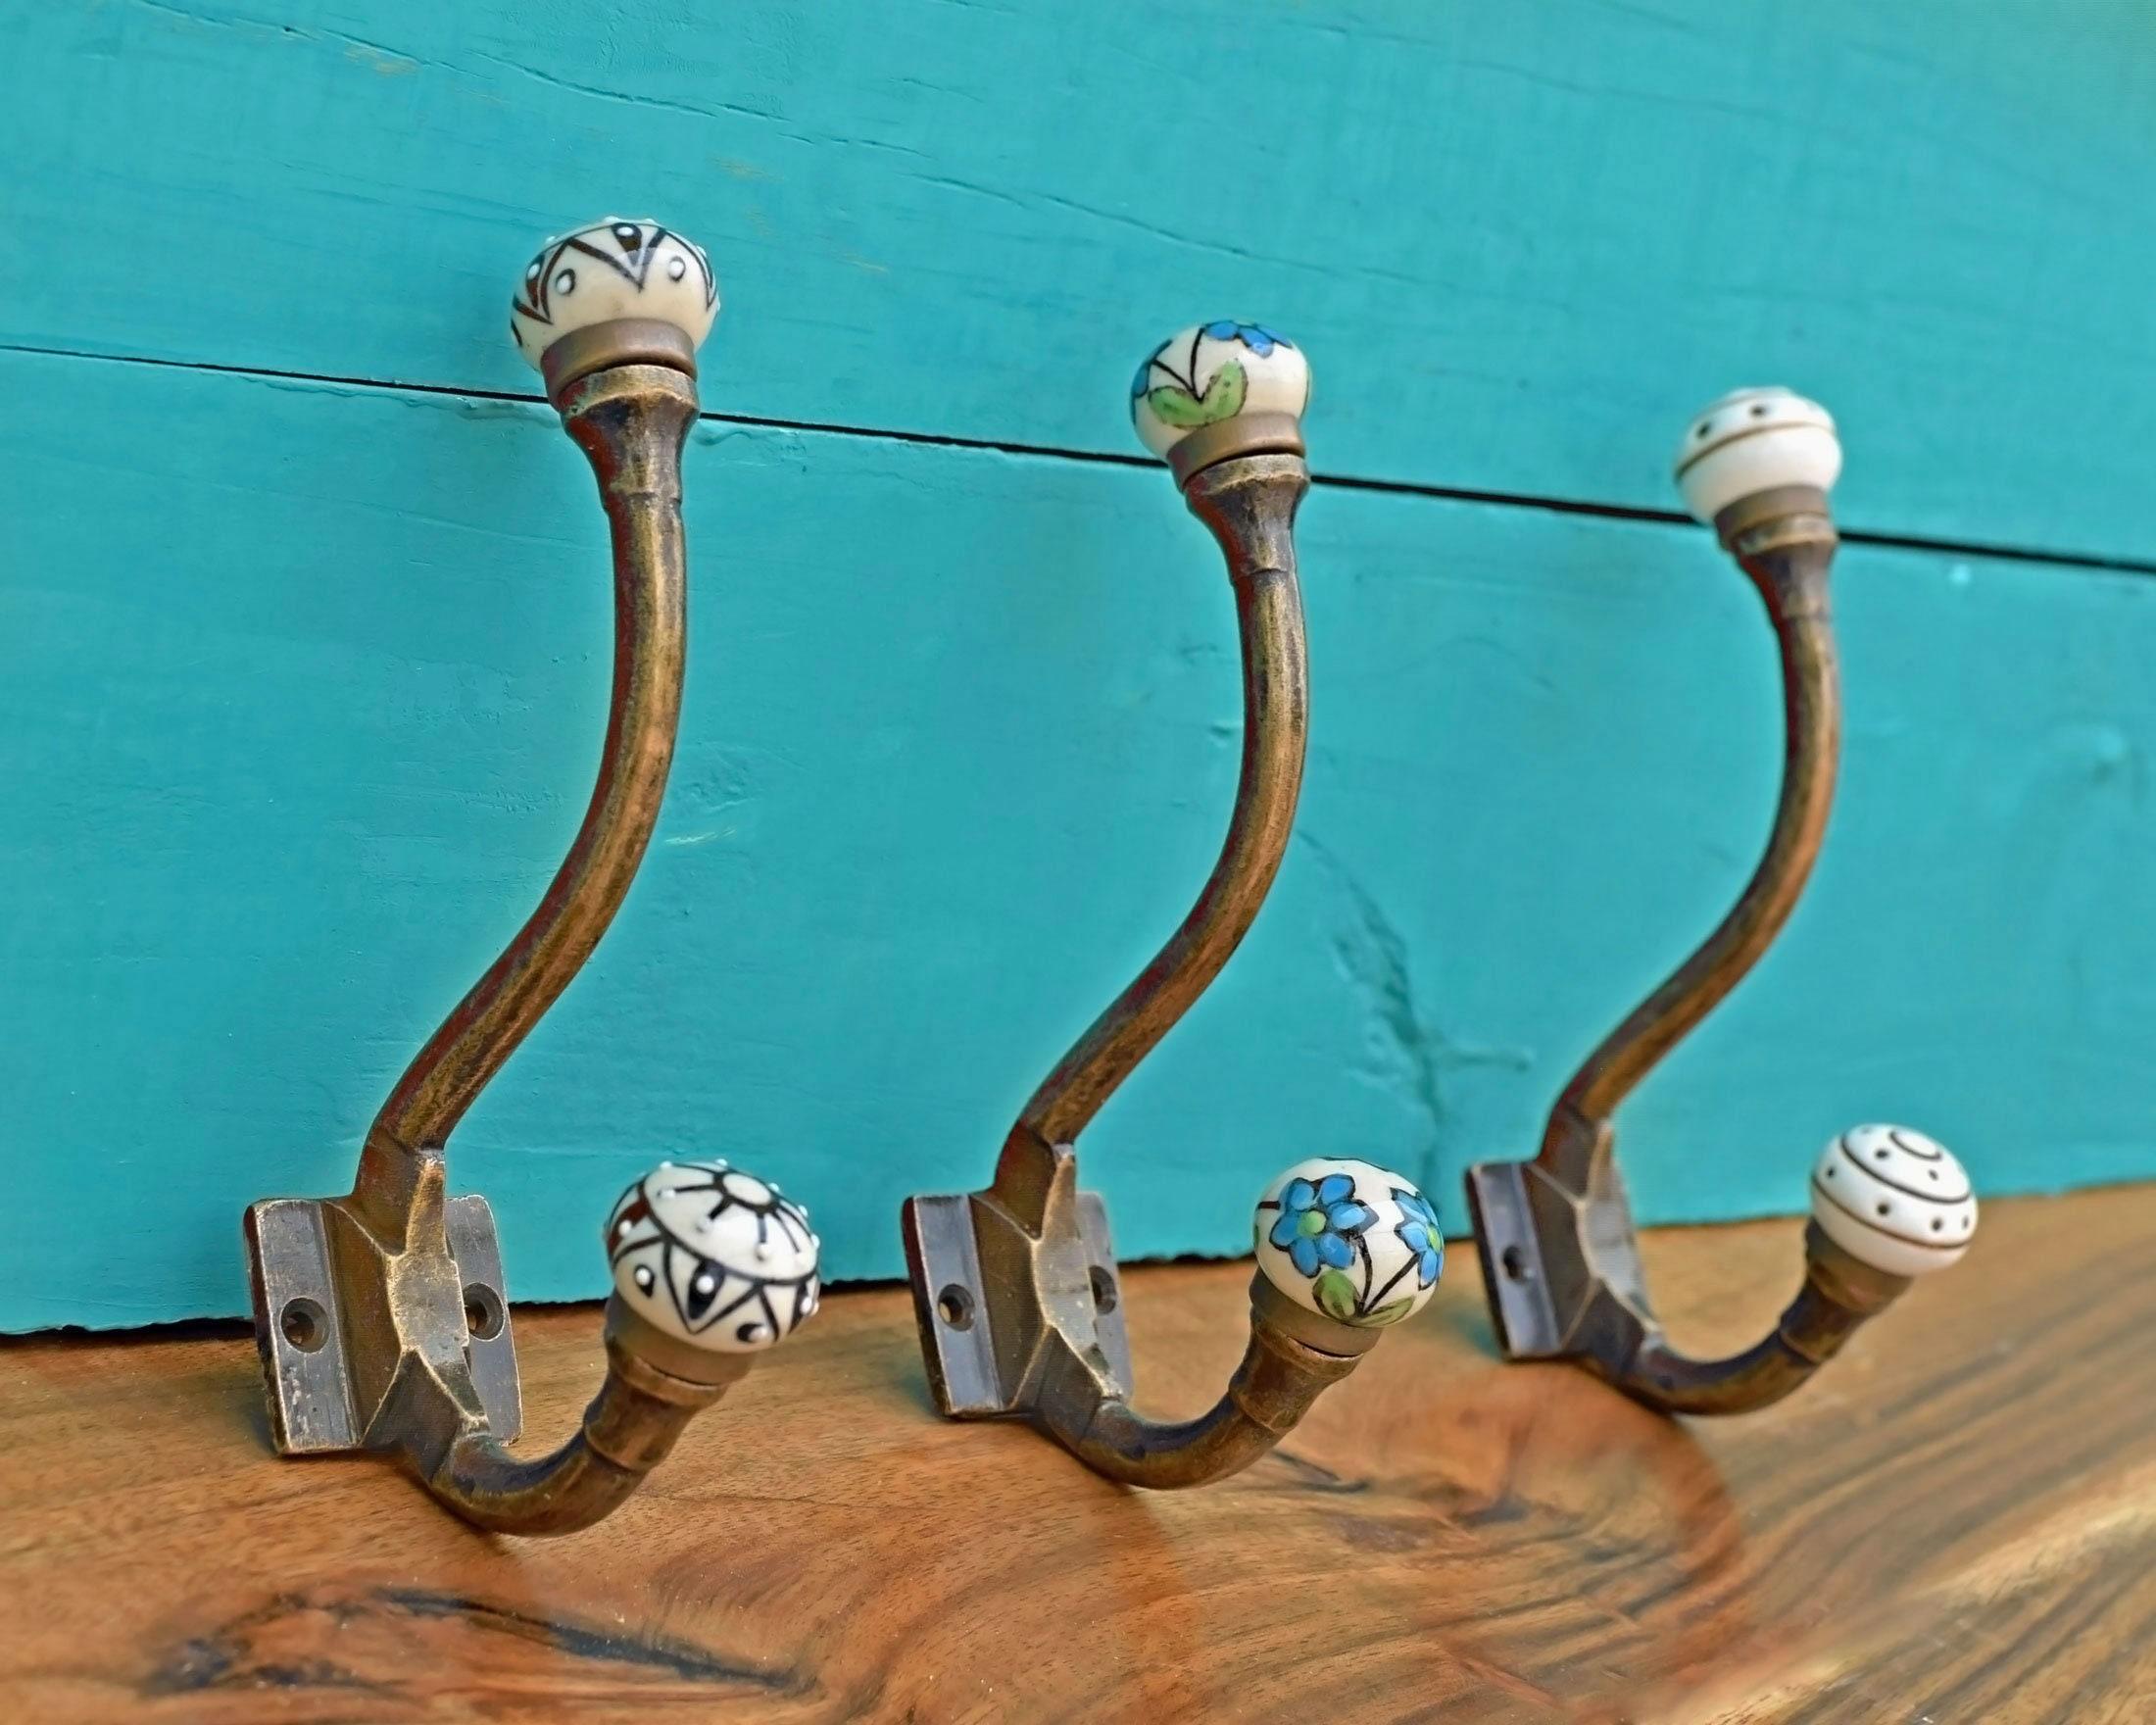 Ceramic Hooks Double Vintage Handmade Shabby Chic Floral Wall Coat Hook Hanger